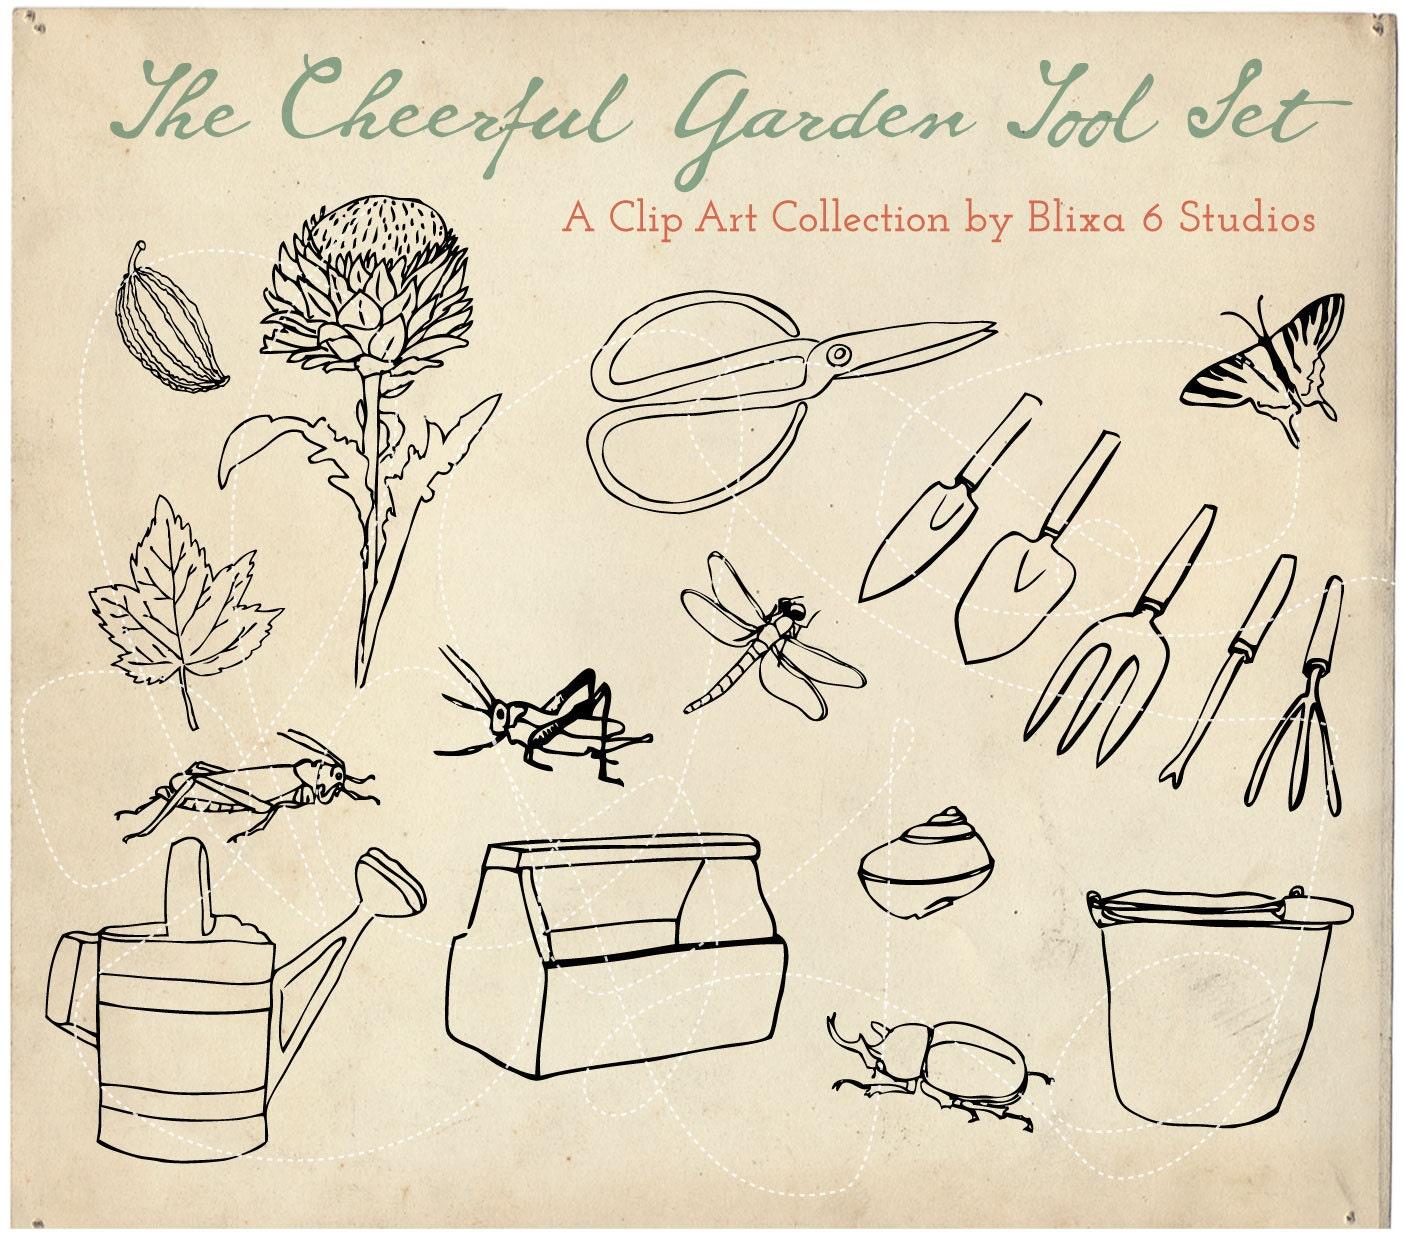 Garden Tool Digital Clip Art 18 Cheerful Line Drawings of